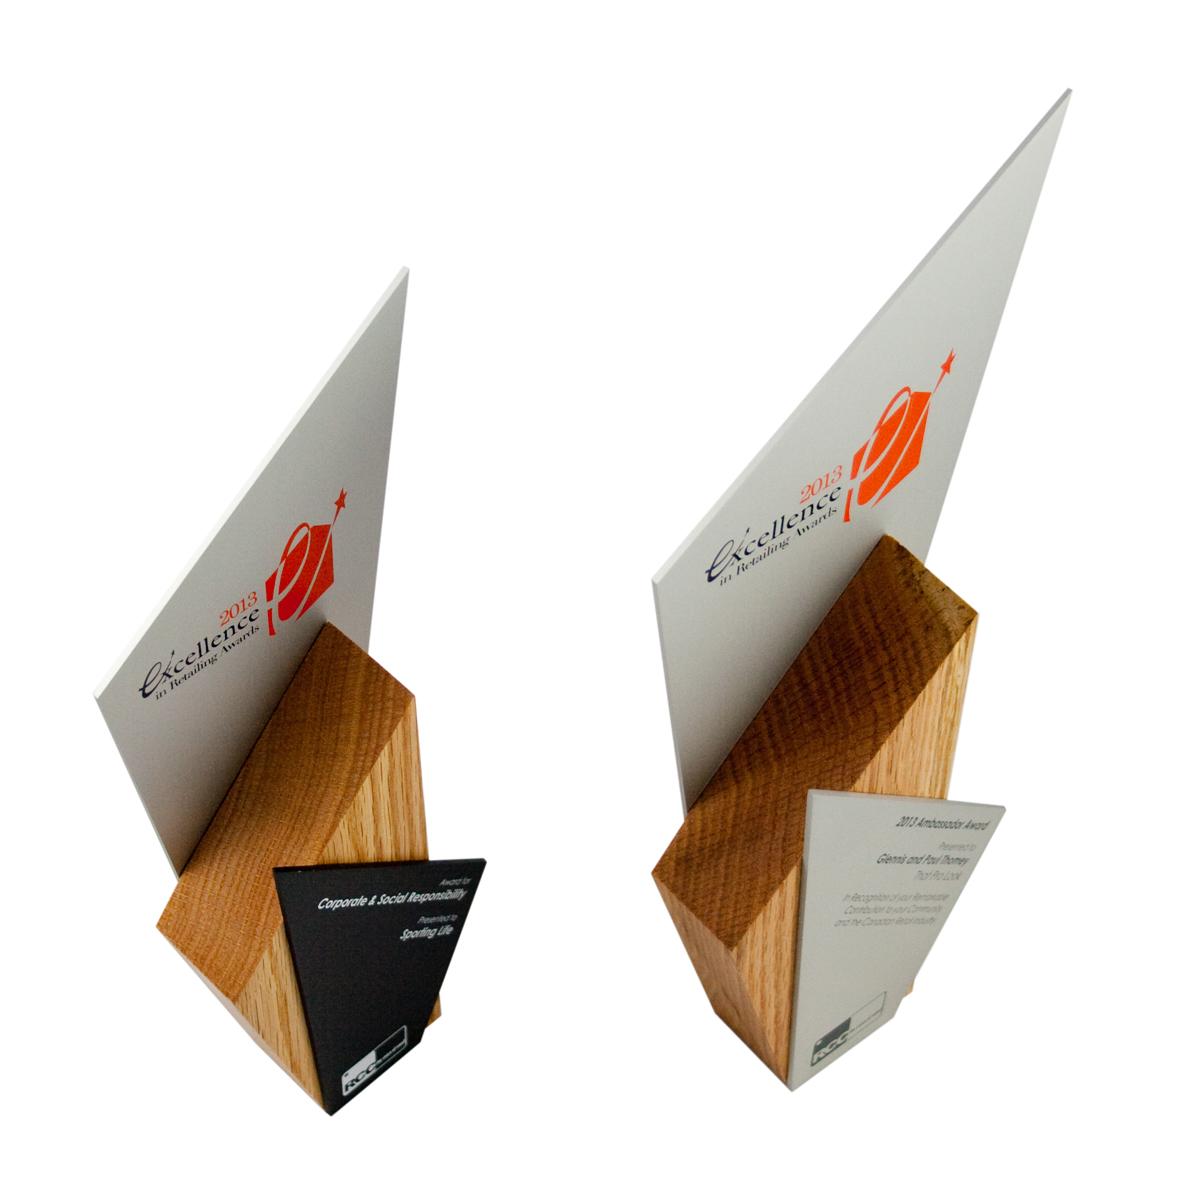 retail-council-of-canada-awards03.jpg